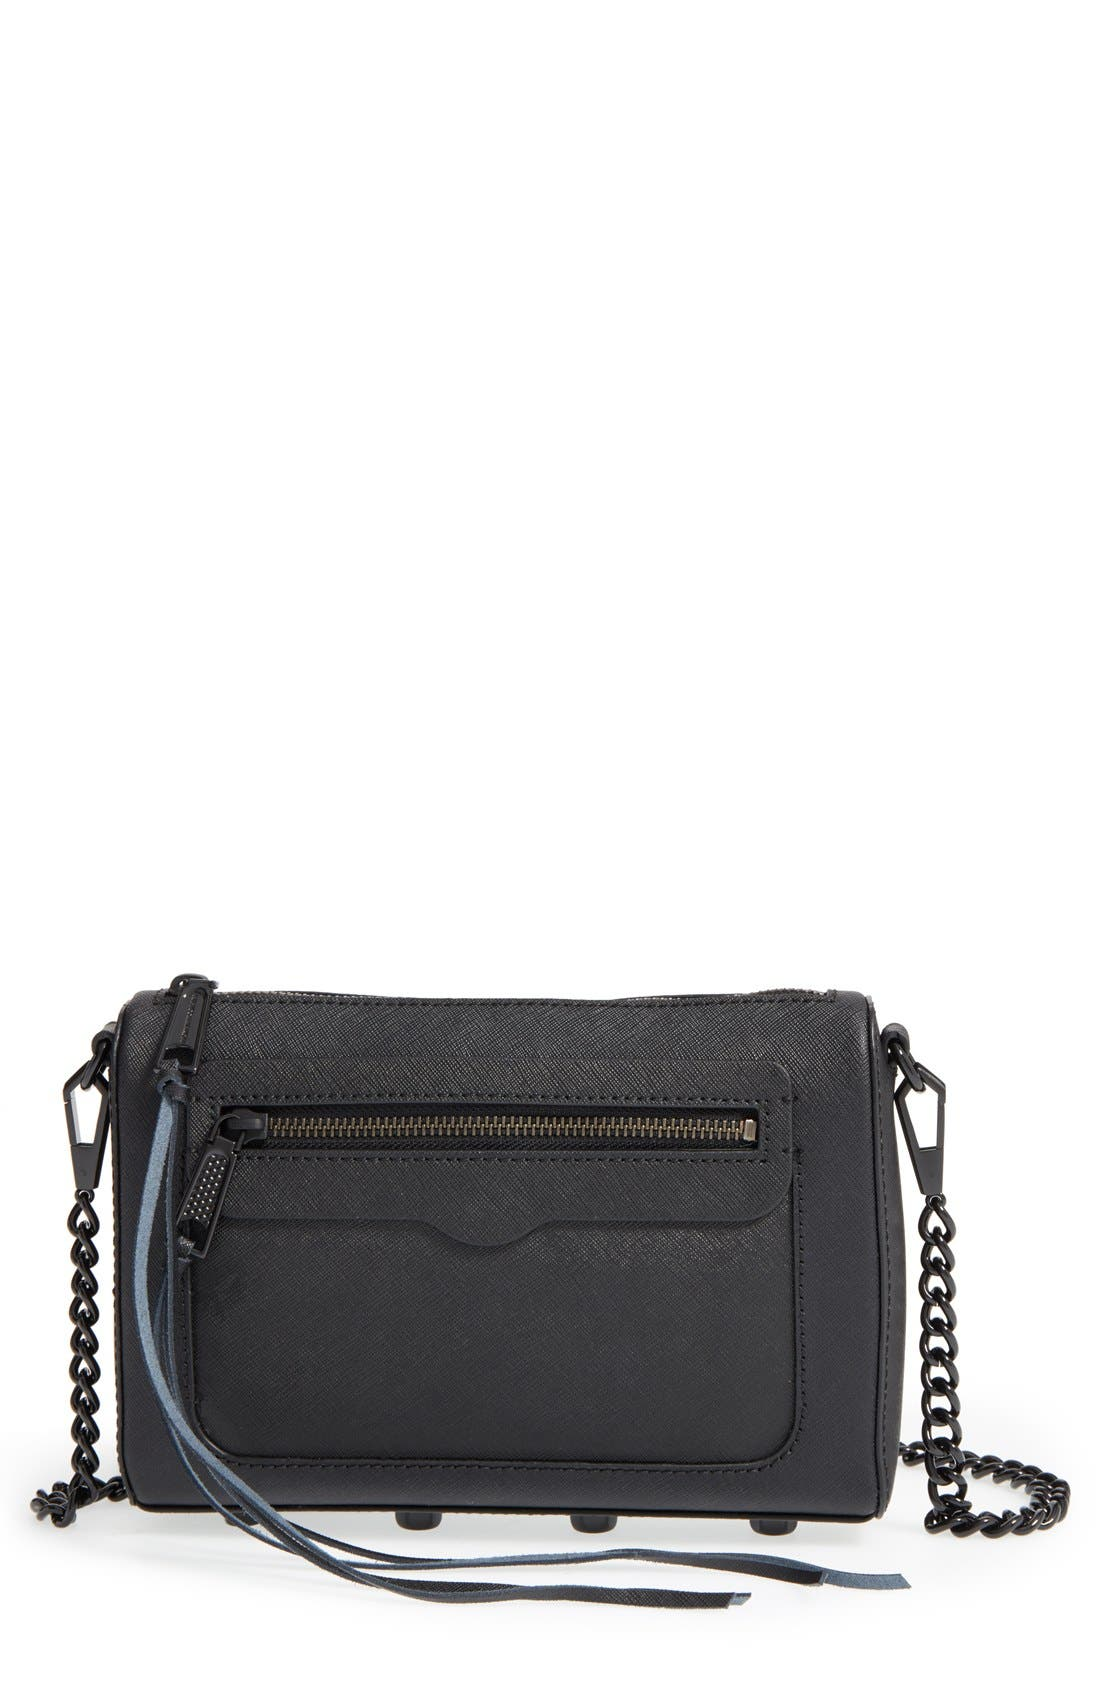 'Avery' Crossbody Bag,                             Main thumbnail 1, color,                             Black/ Black Hrdwr